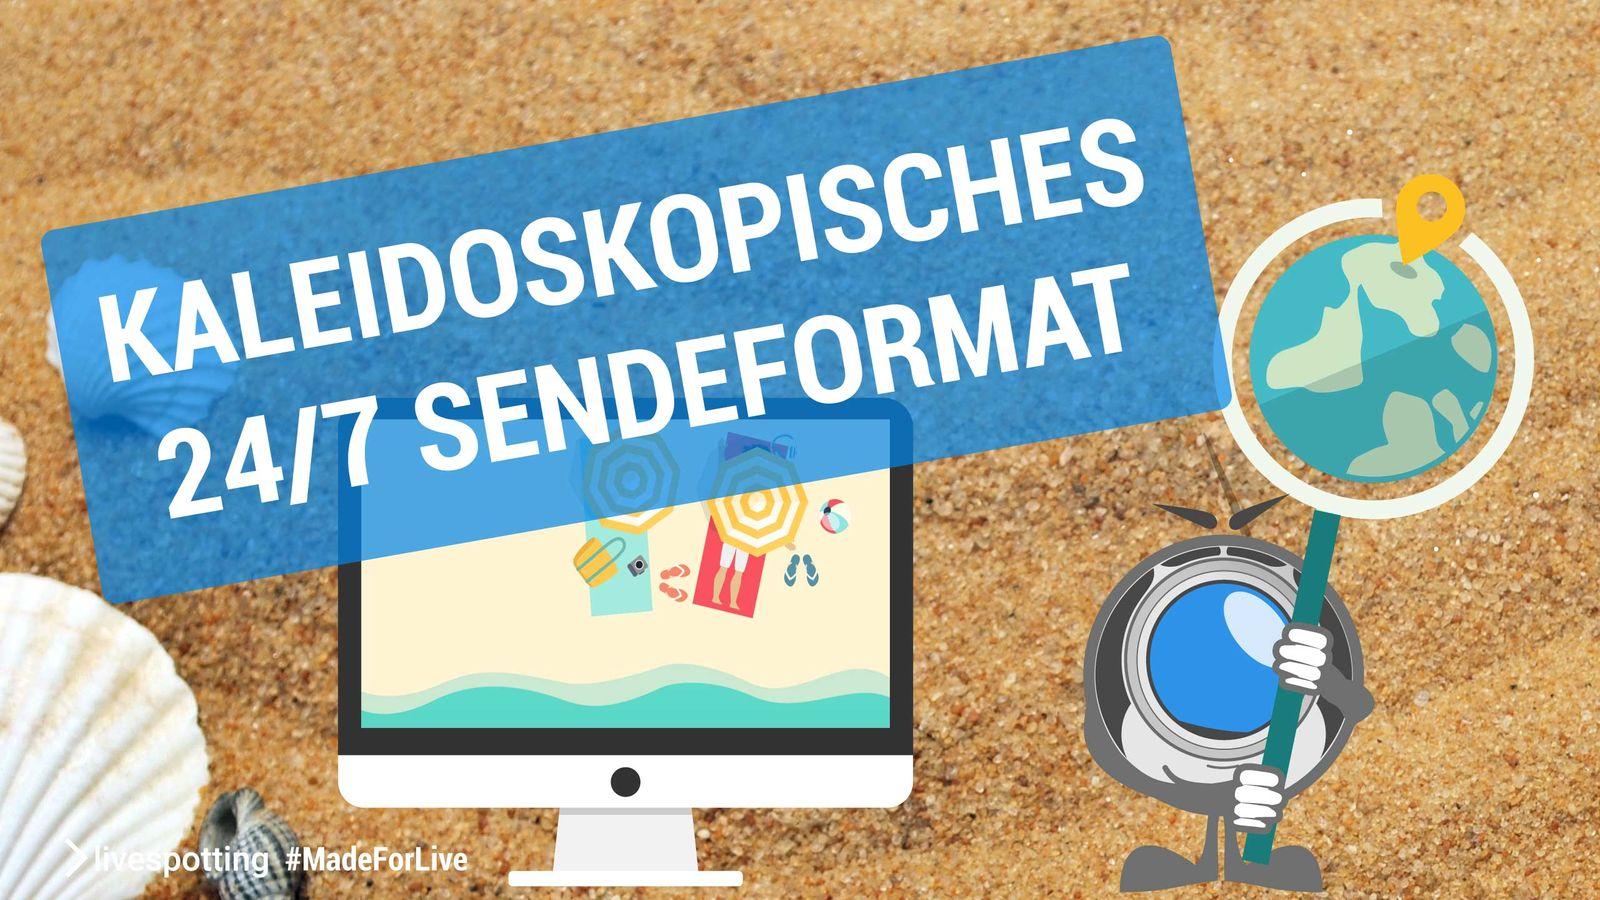 Kaleidoskopisches 24/7 Sendeformat mit echten Live-Streams